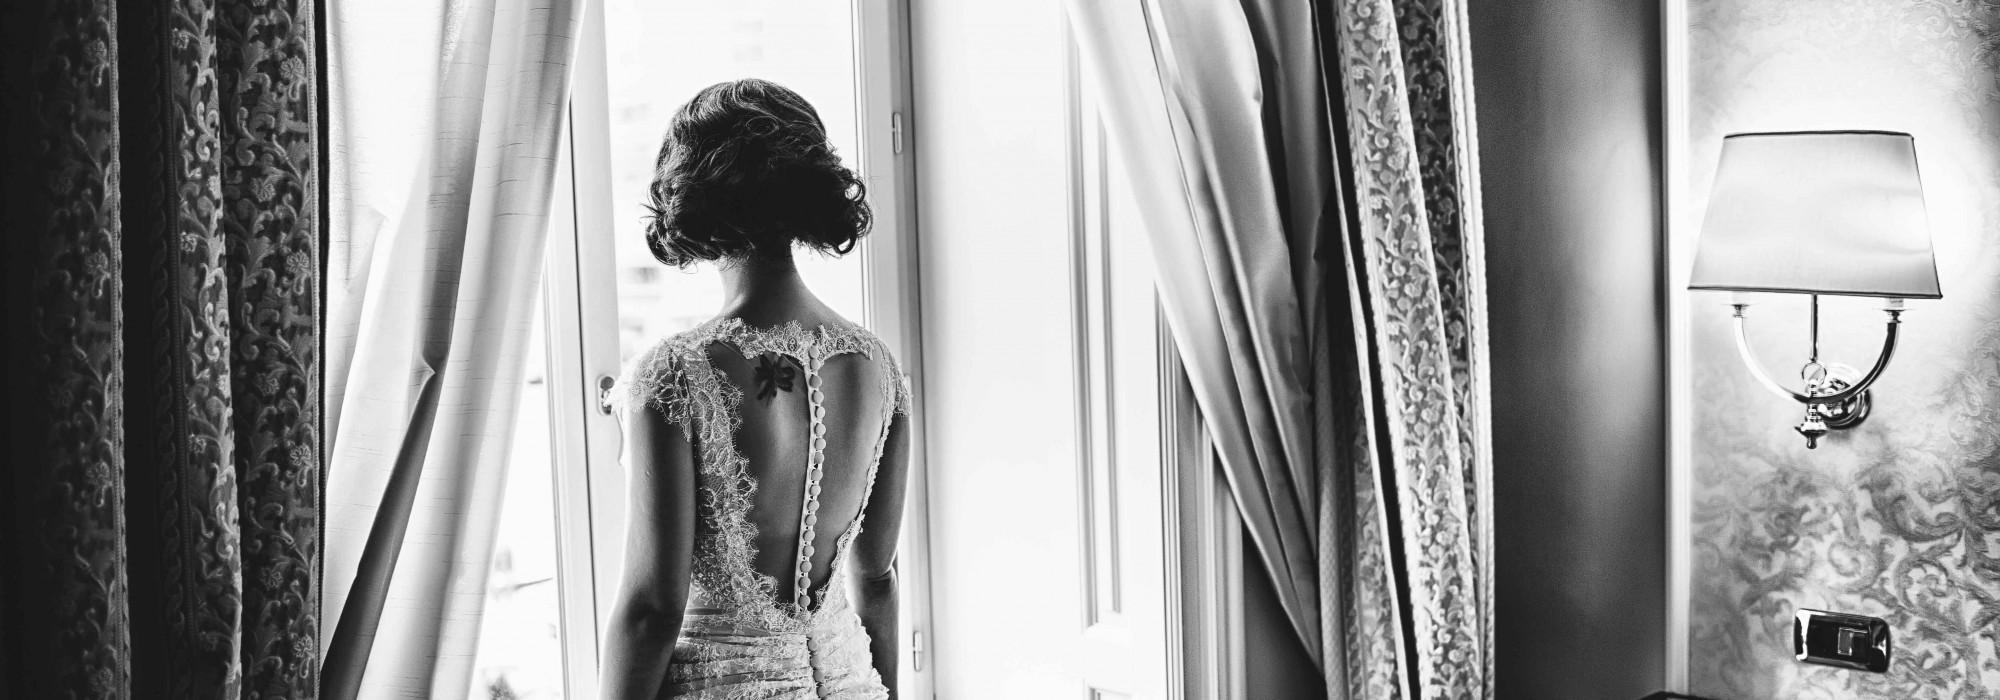 Mireasa si nunta vintage in Bucuresti | Fotograf nunta Sorin Careba